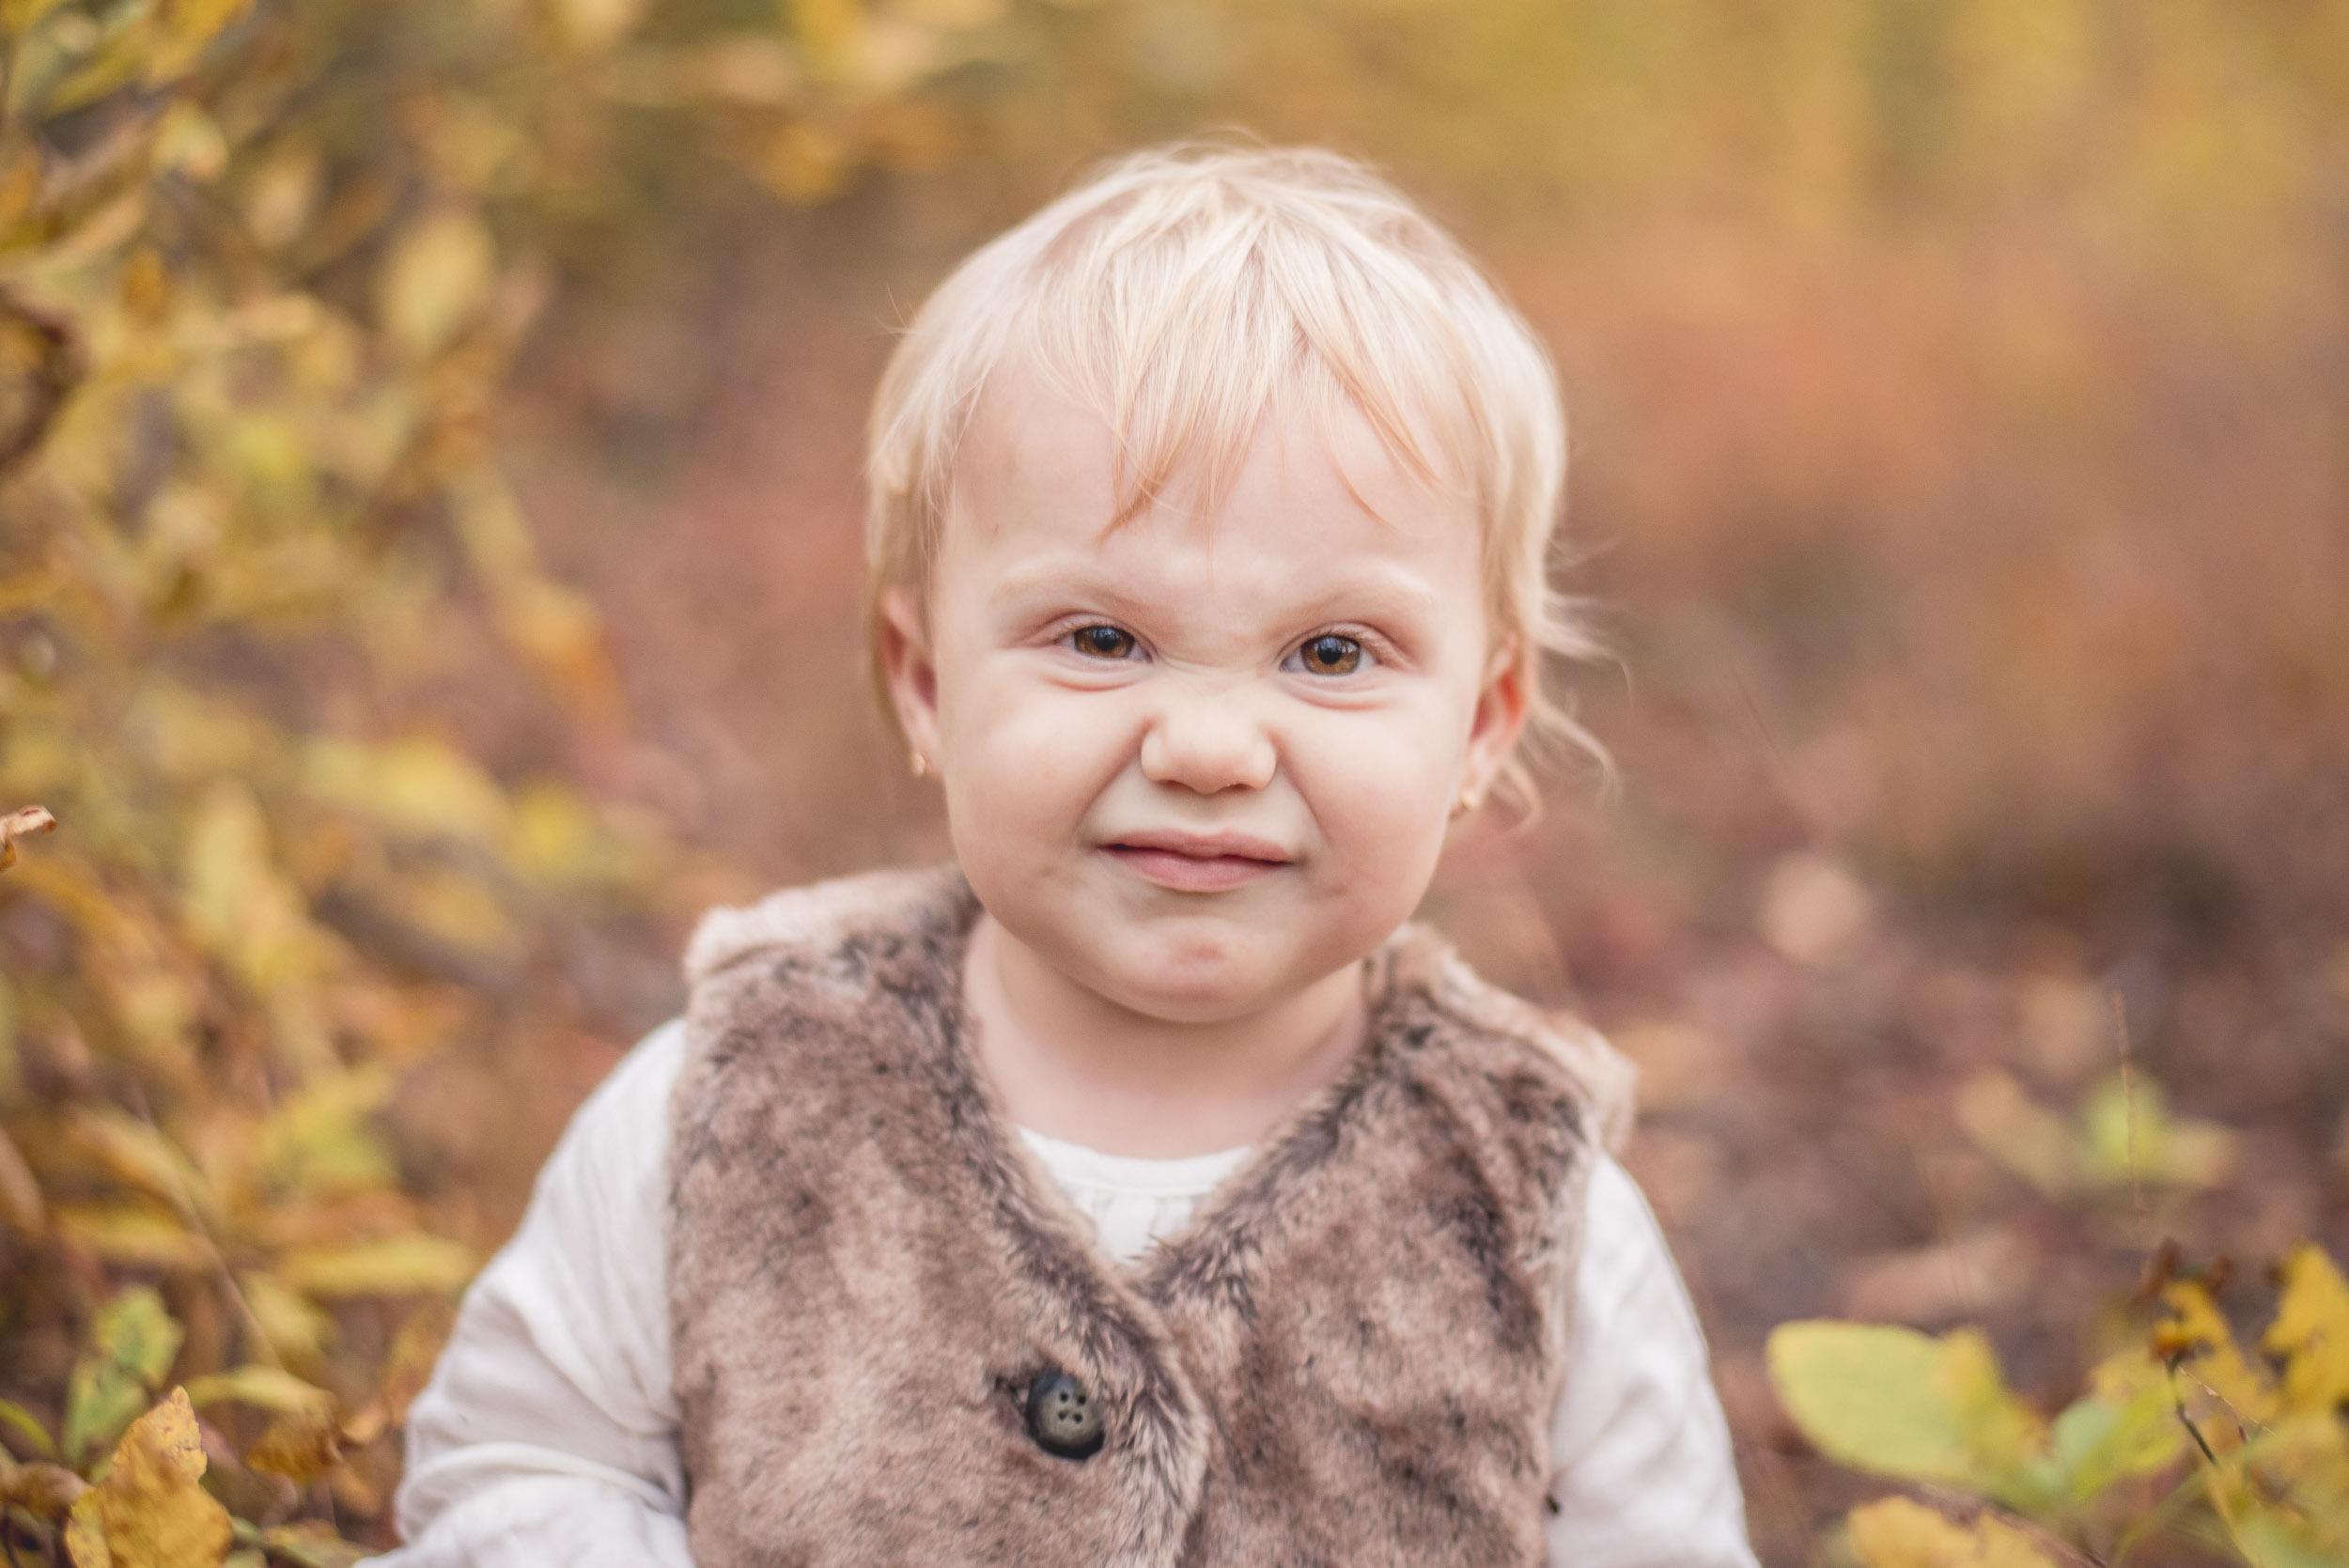 Ramsey_Child_Family_Photo_Session_Maryland_Crofton_Gambrills(11of12).jpg